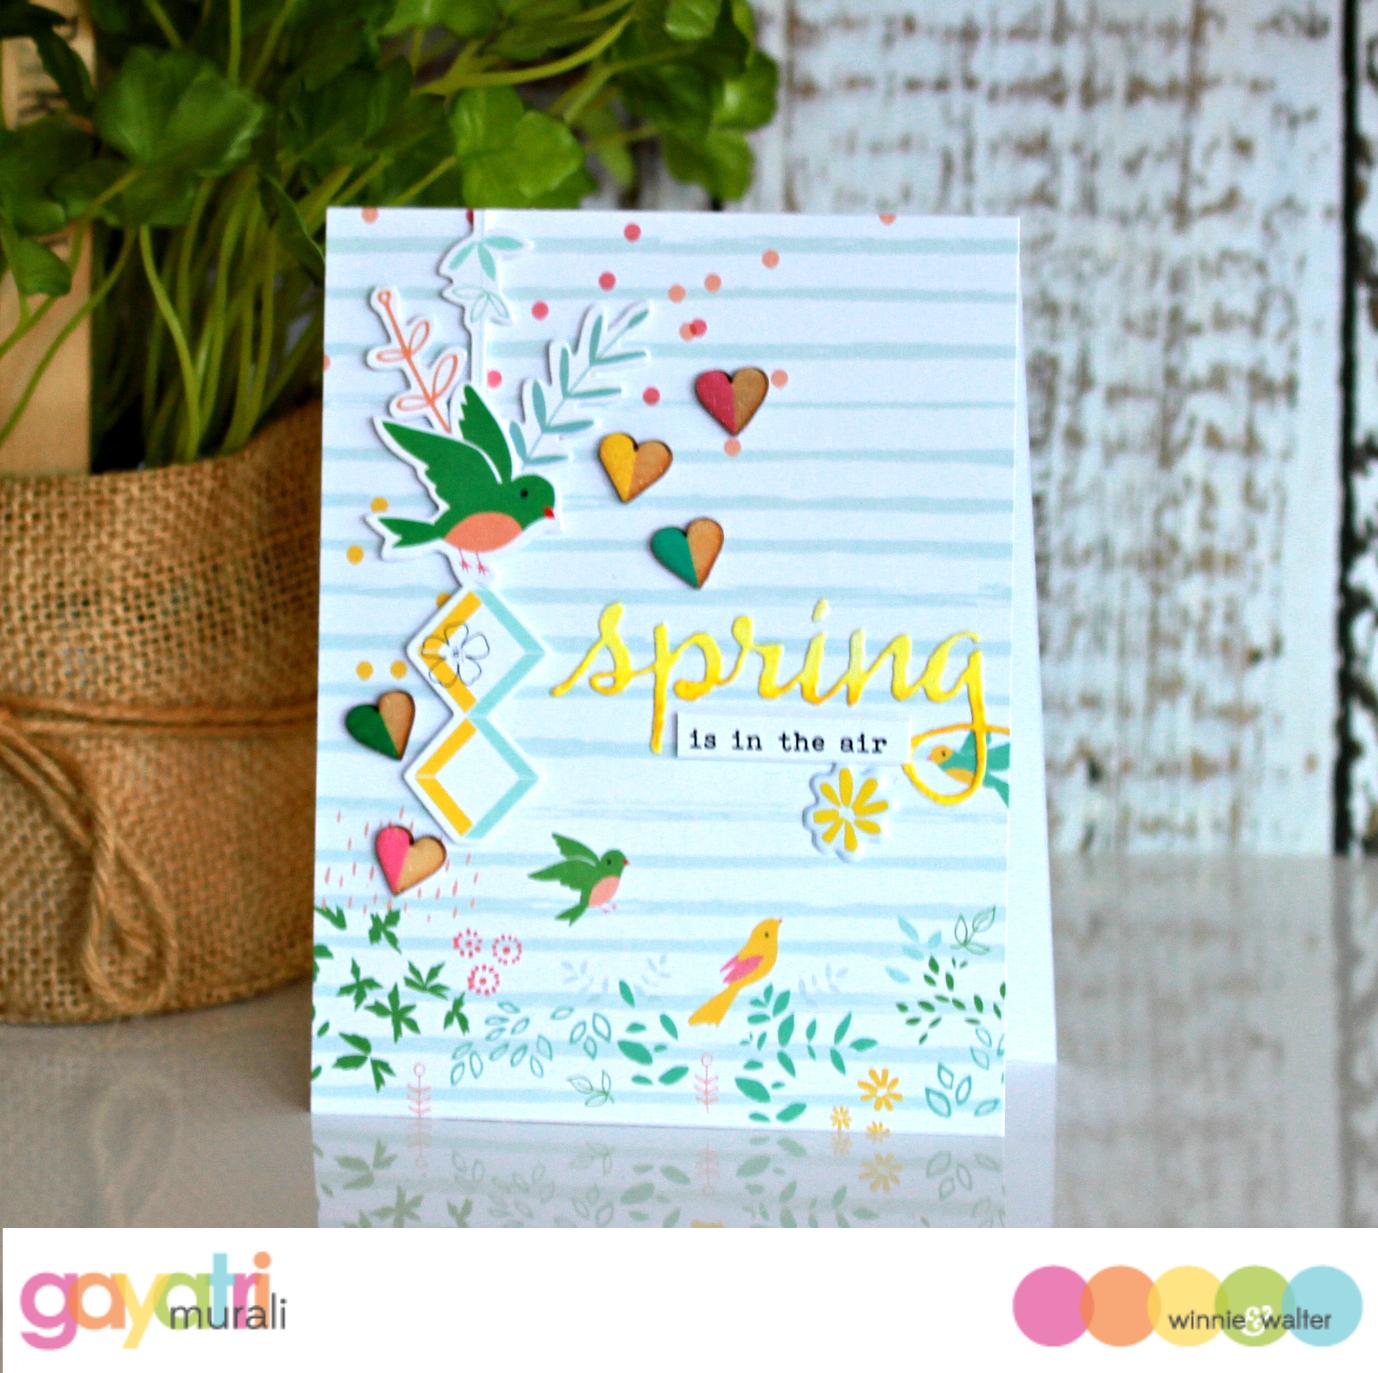 gayatri_Spring card